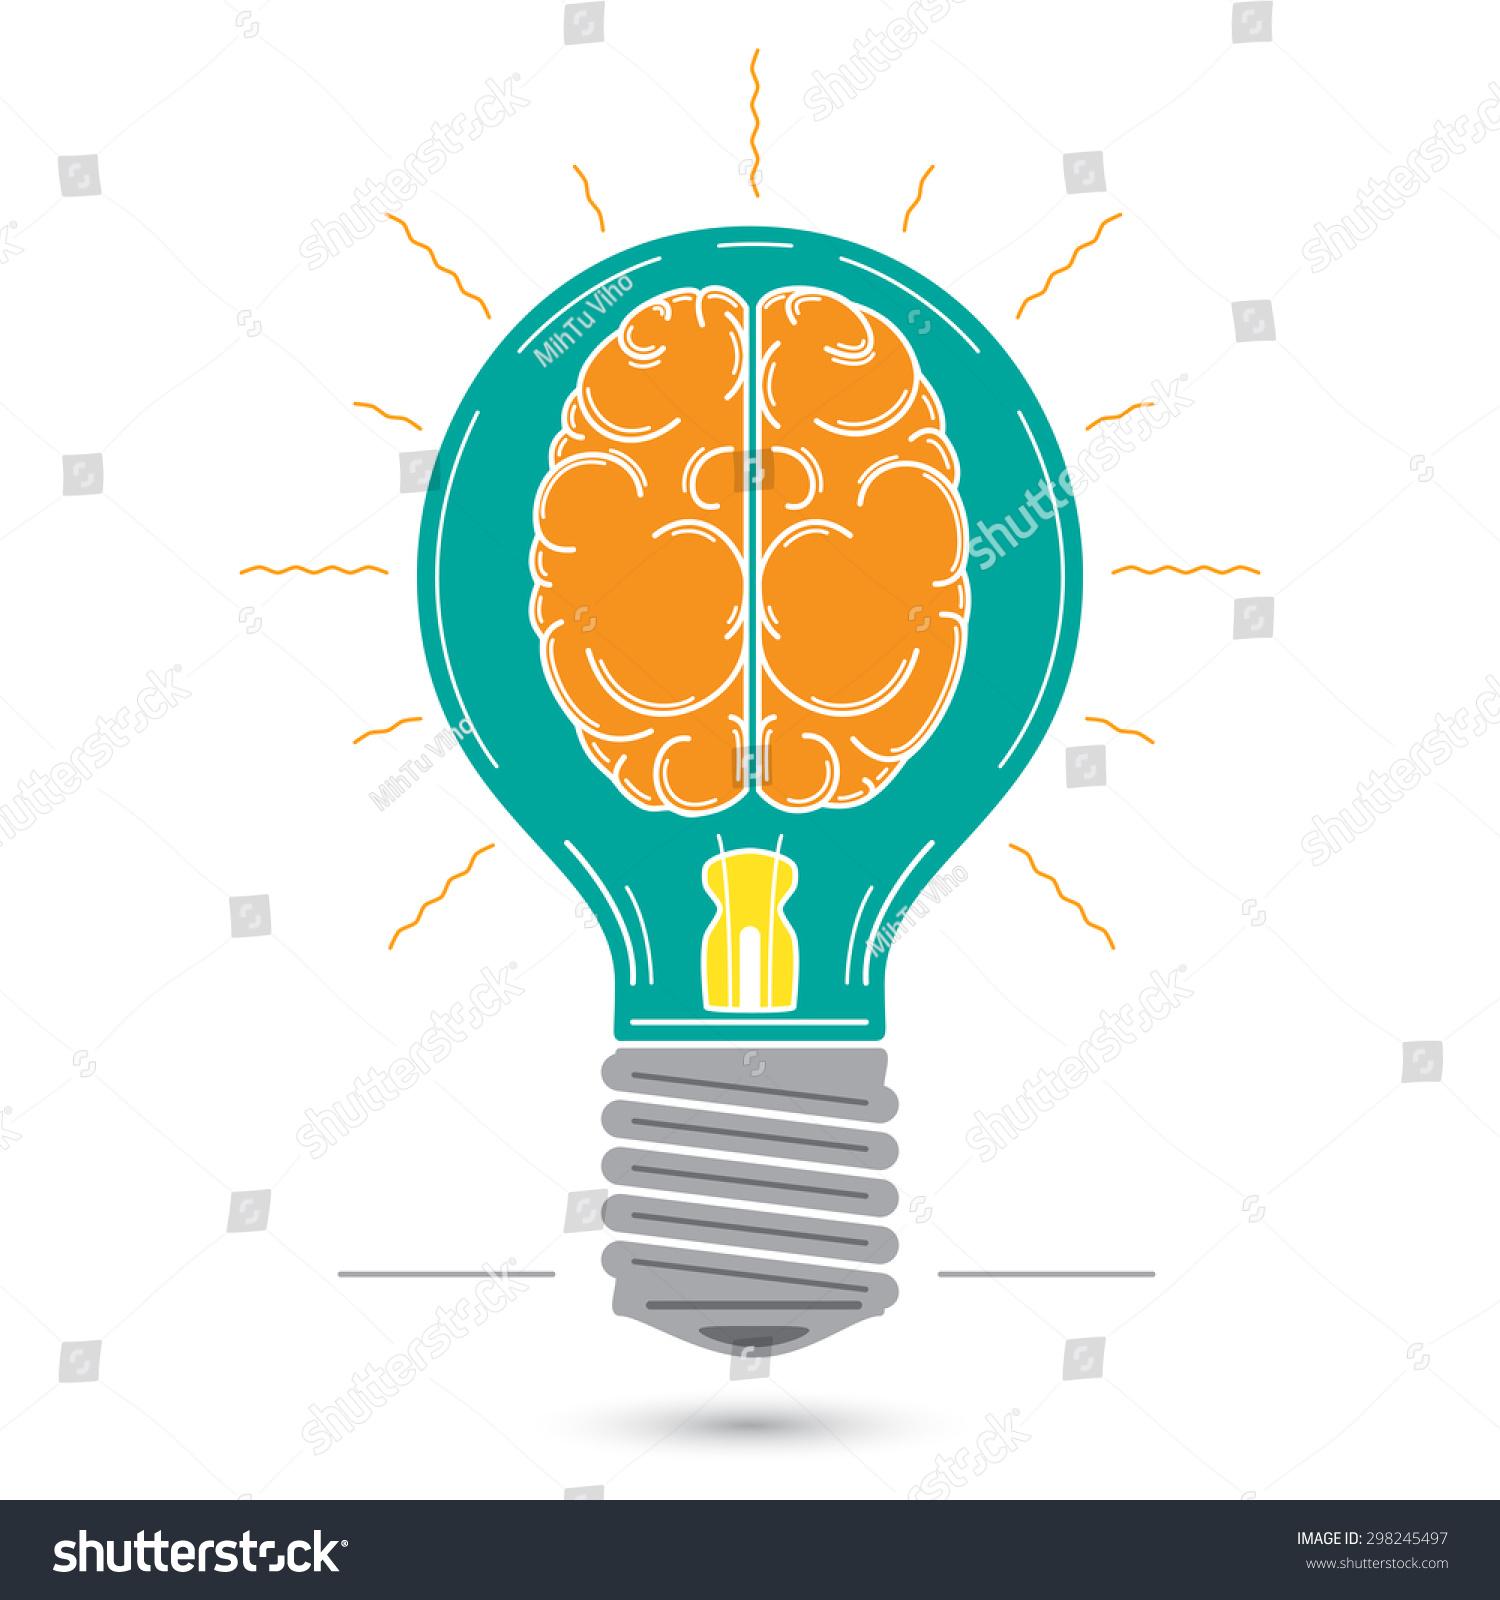 Vector Graphic Image Bulb Human Brain Stock Vector 298245497 ...